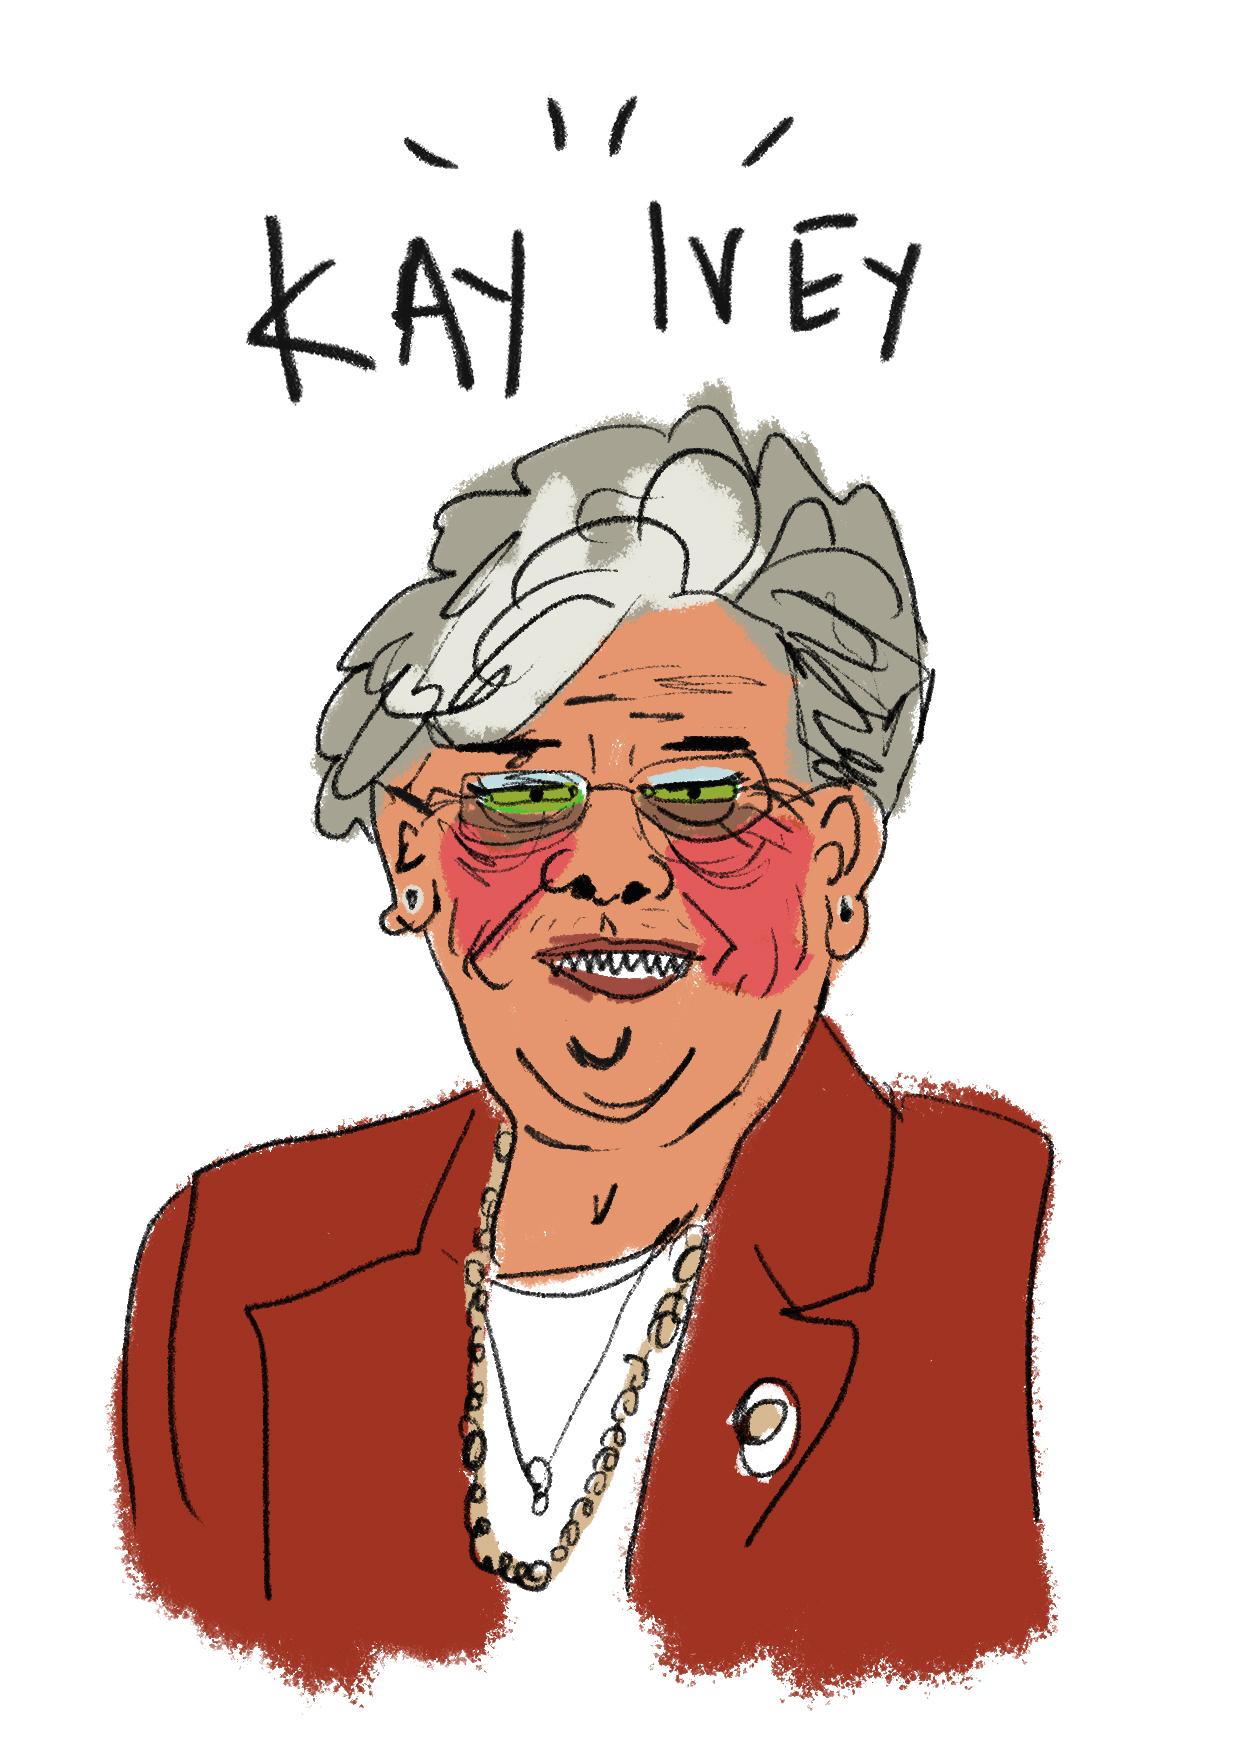 KayIvey.jpg